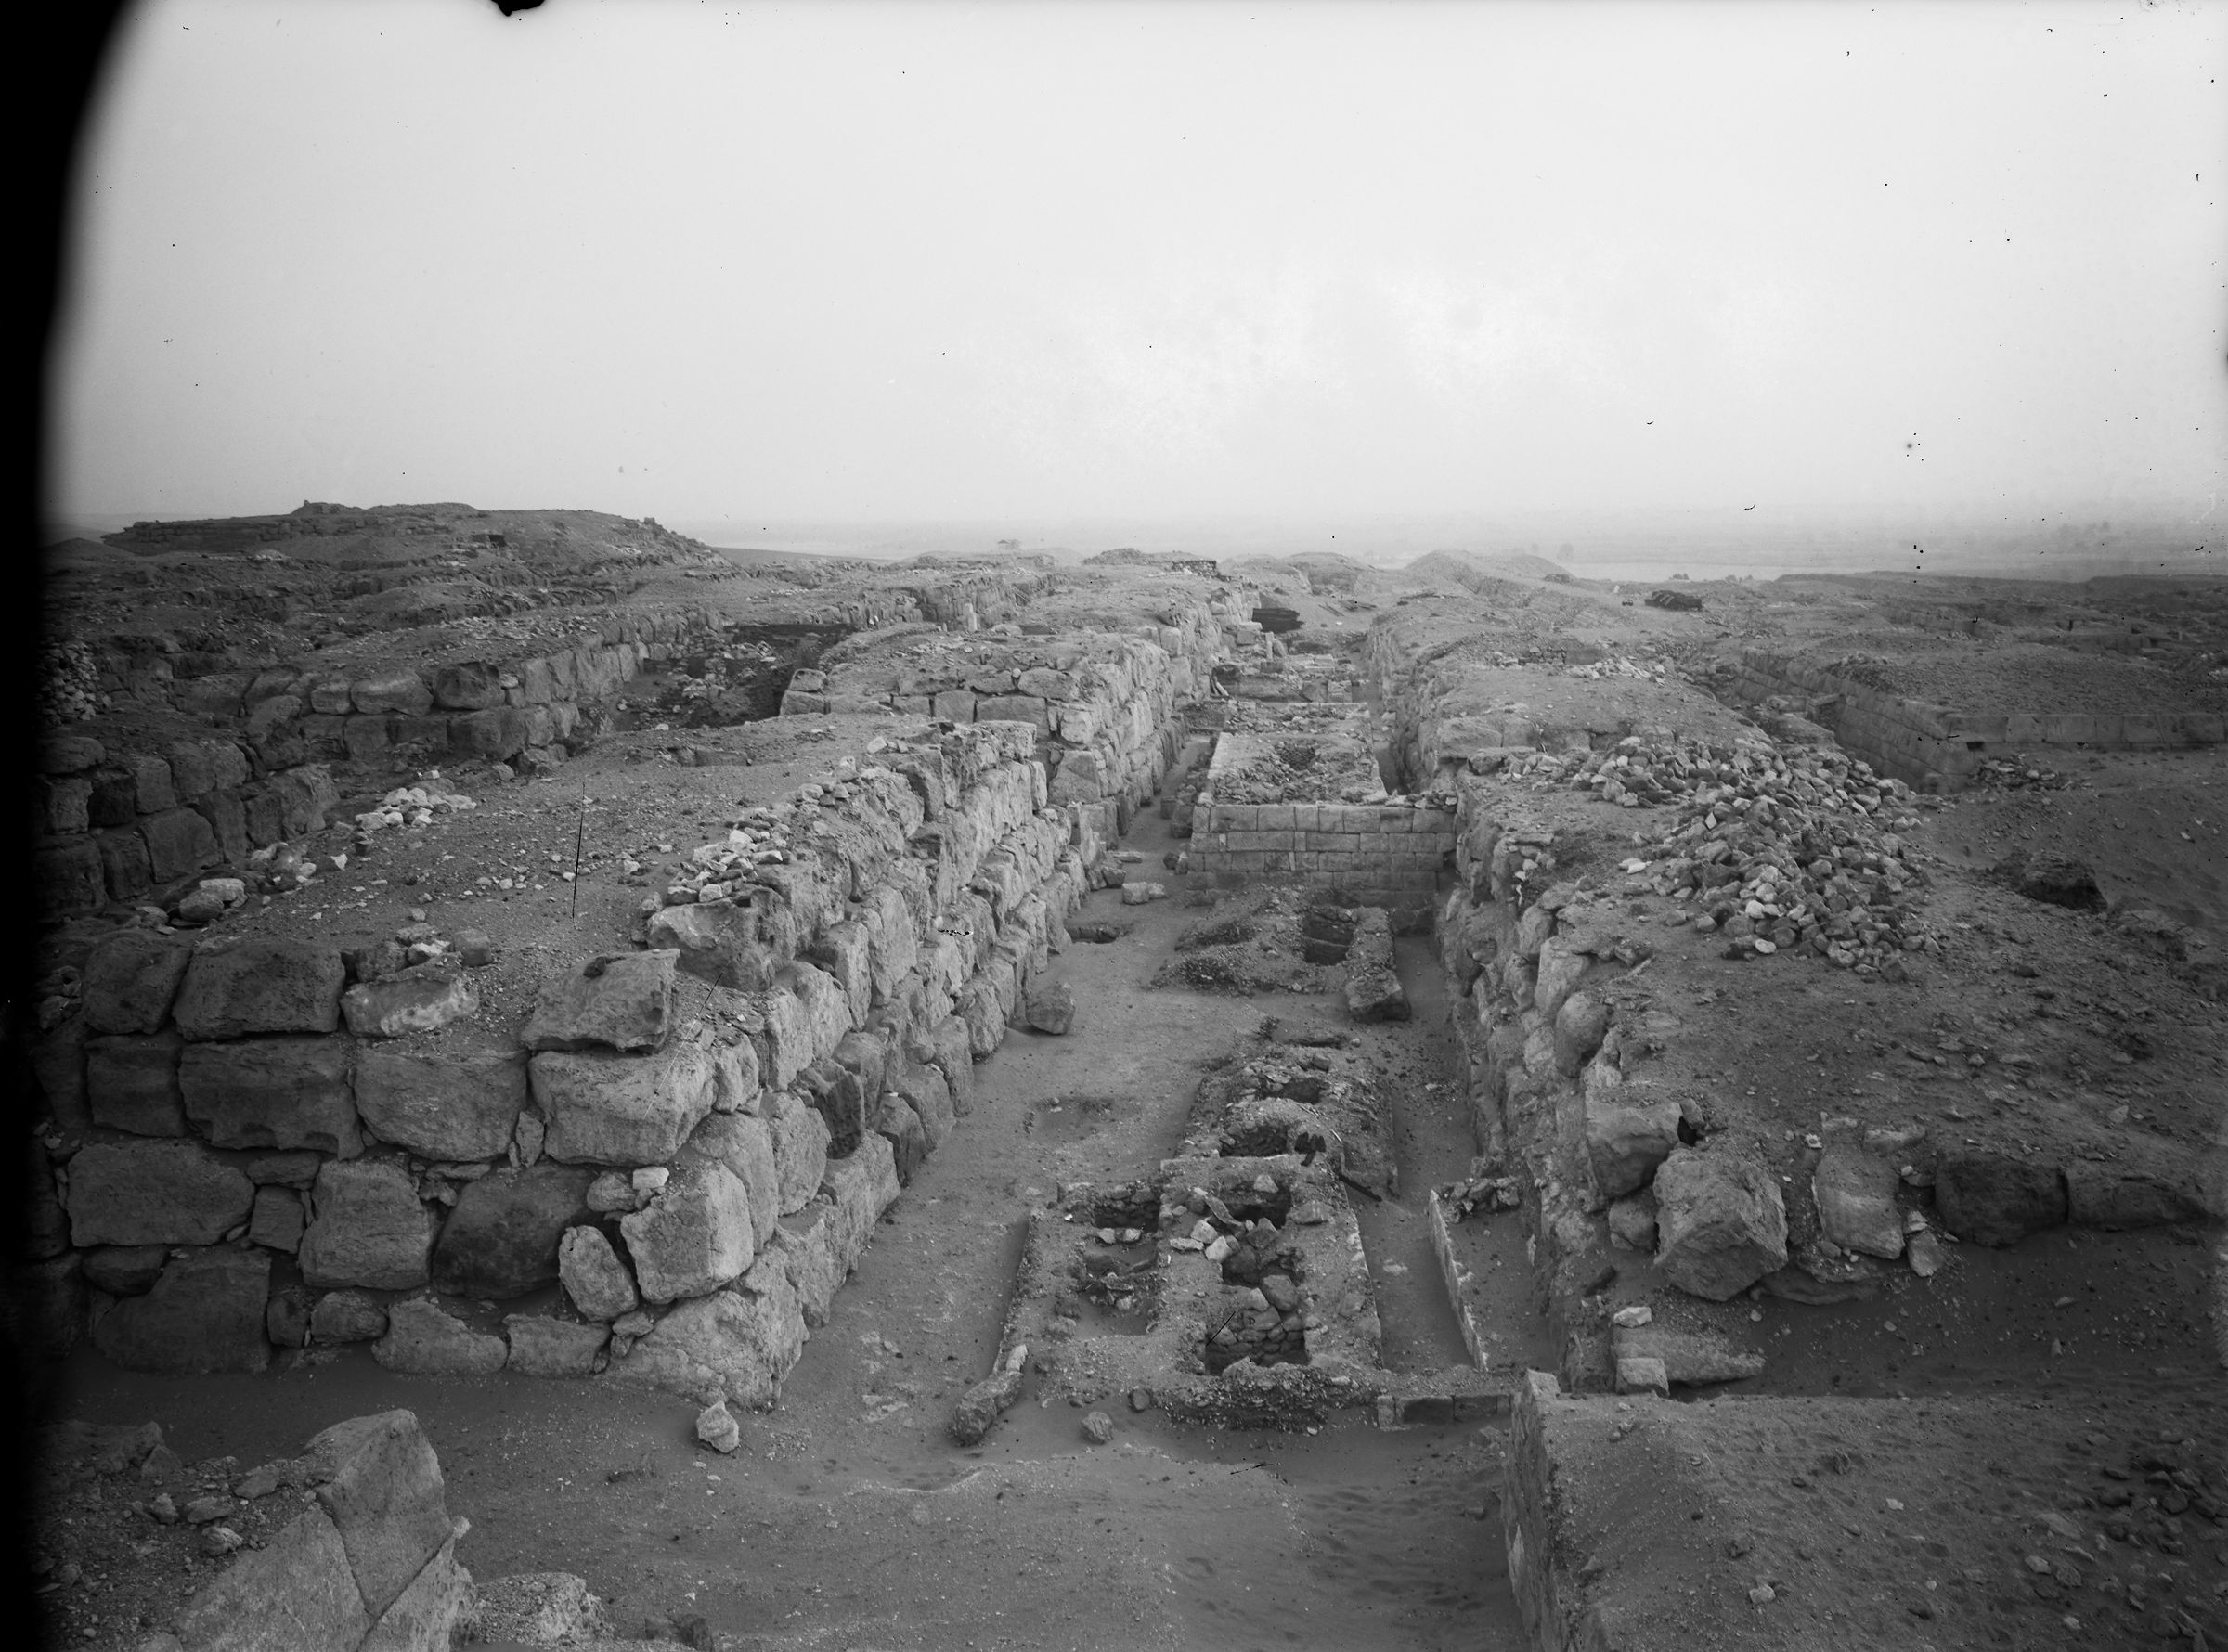 Western Cemetery: Site: Giza; View: G 4720, G 4820, G 4722, G 4724, G 4725, G 4733